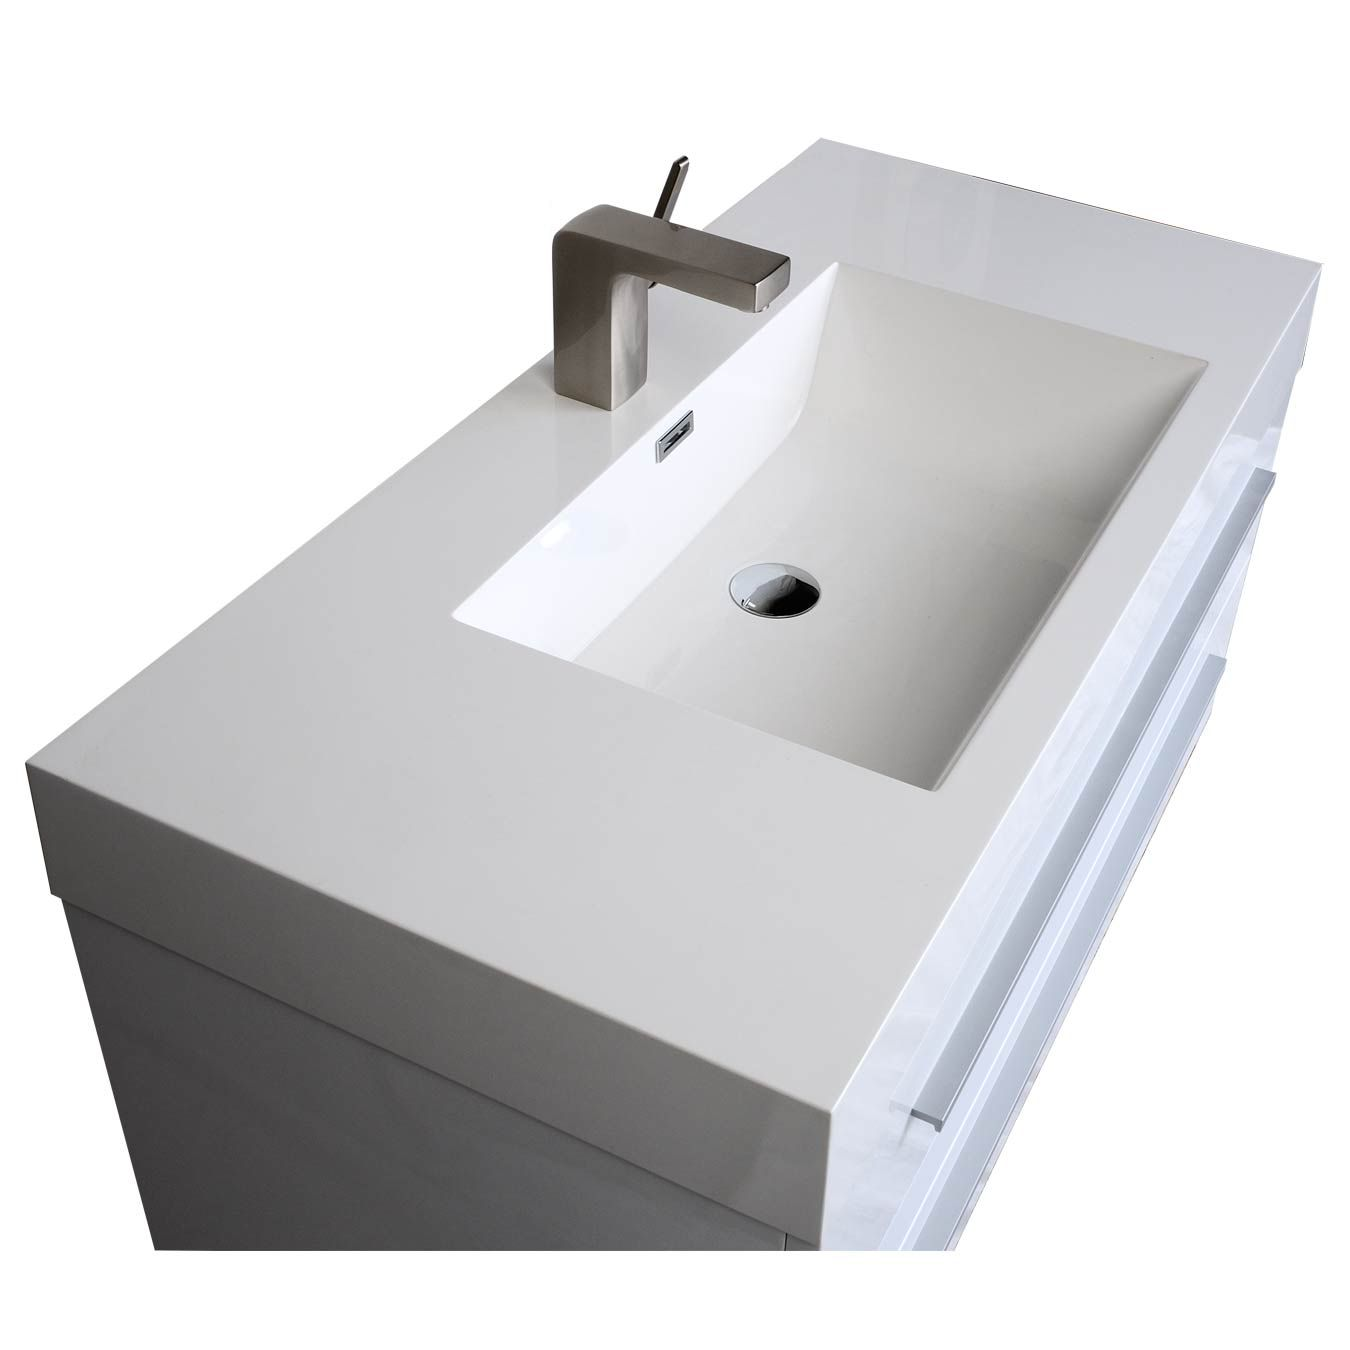 Beau 35.5 In. Wall Mount Modern Bathroom Vanity In High Gloss White TN M900